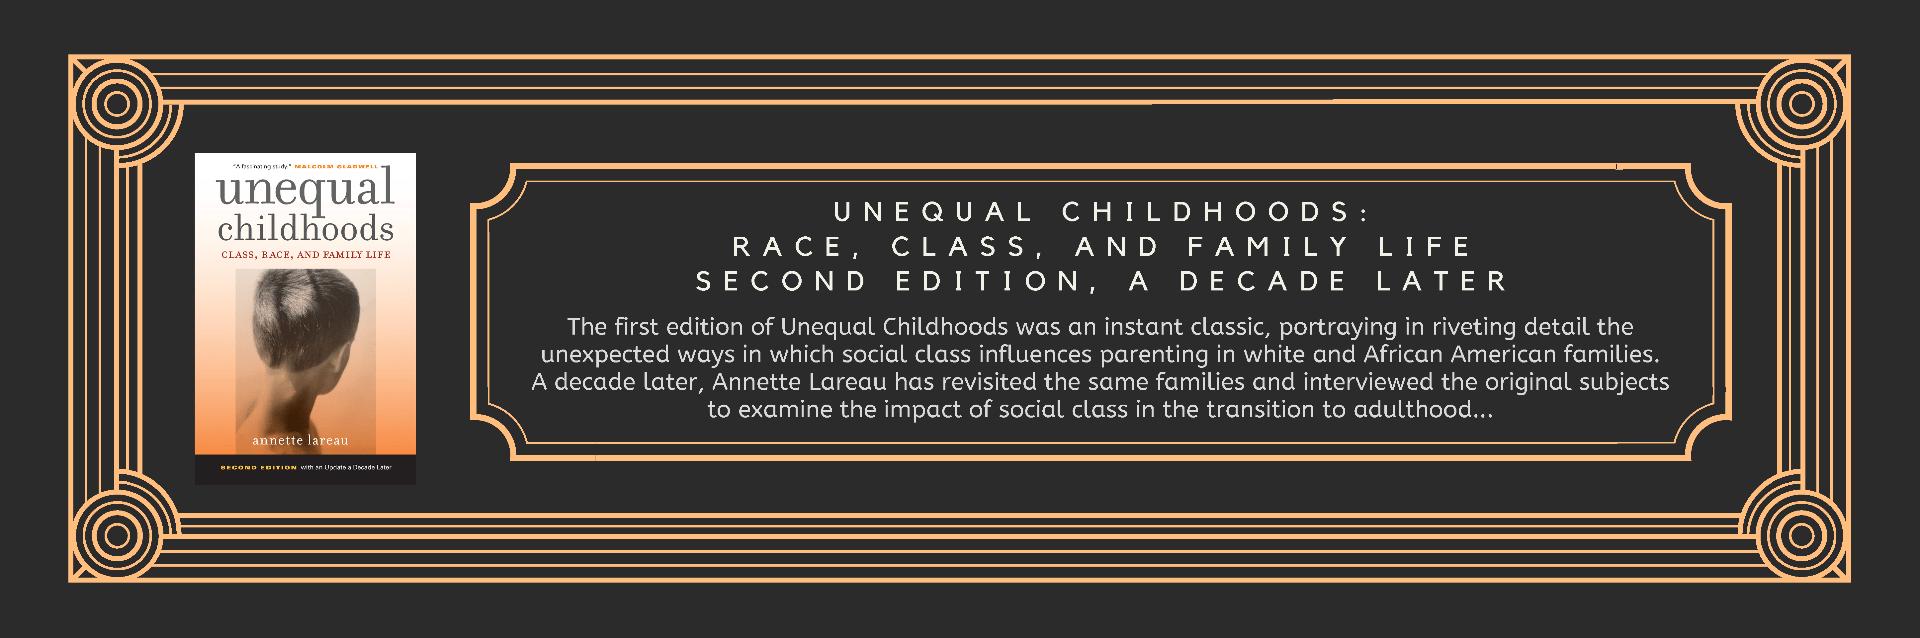 Book Unequal Childhoods